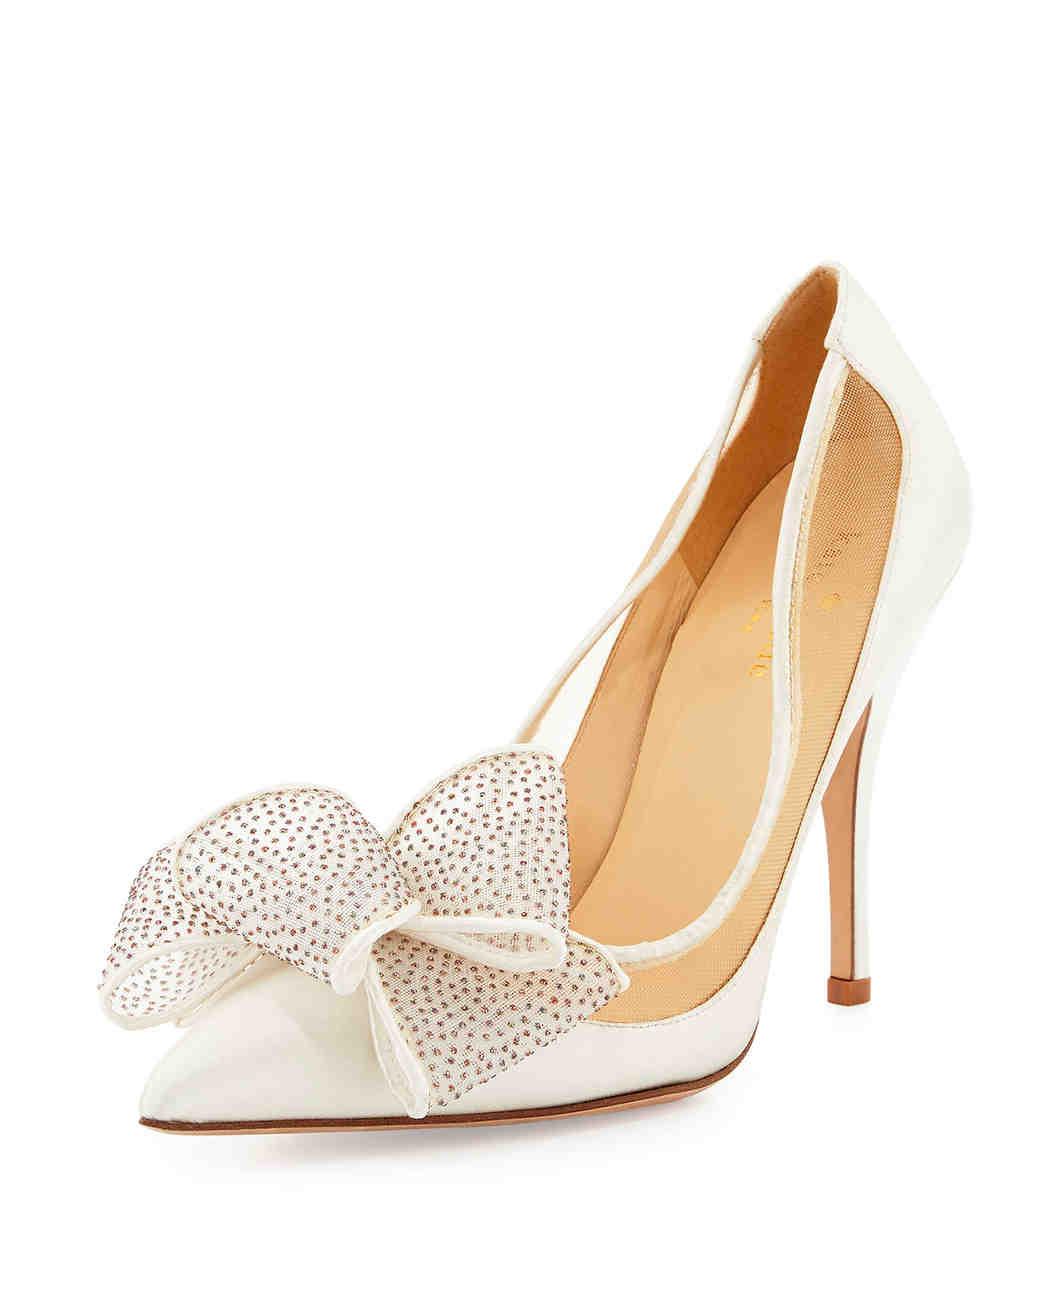 closed-toe-wedding-shoes-kate-spade-neiman-marcus-1215.jpg